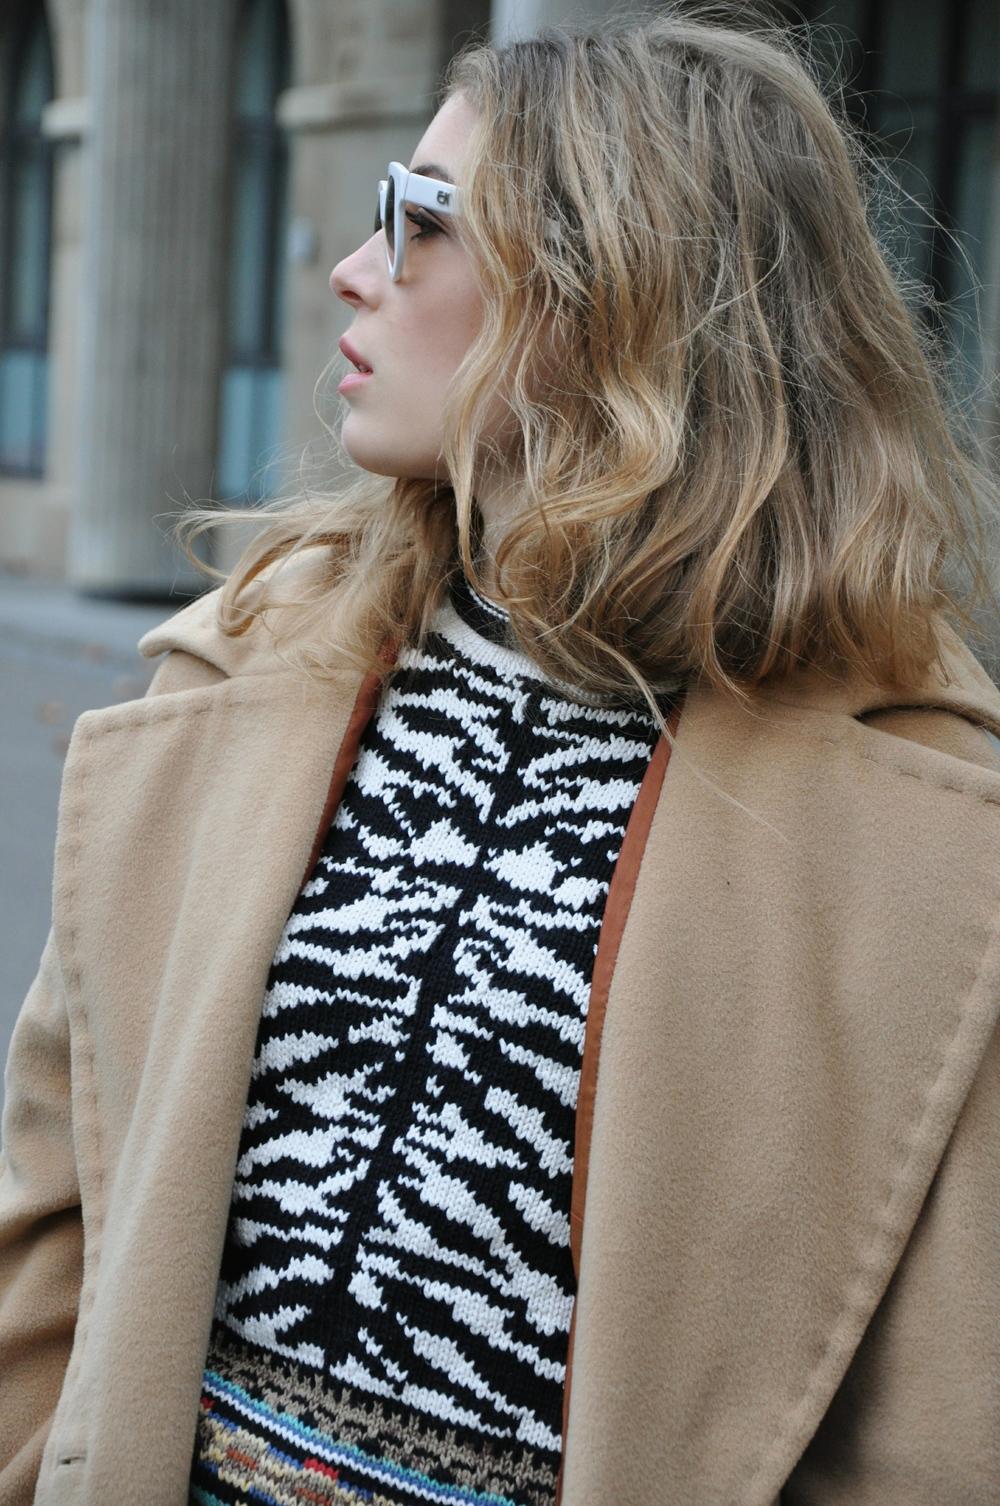 coatVintage pull Jet Set jeans COS earrings H&M purse Prada sunglasses Emmanuelle Khanh shoes Zara